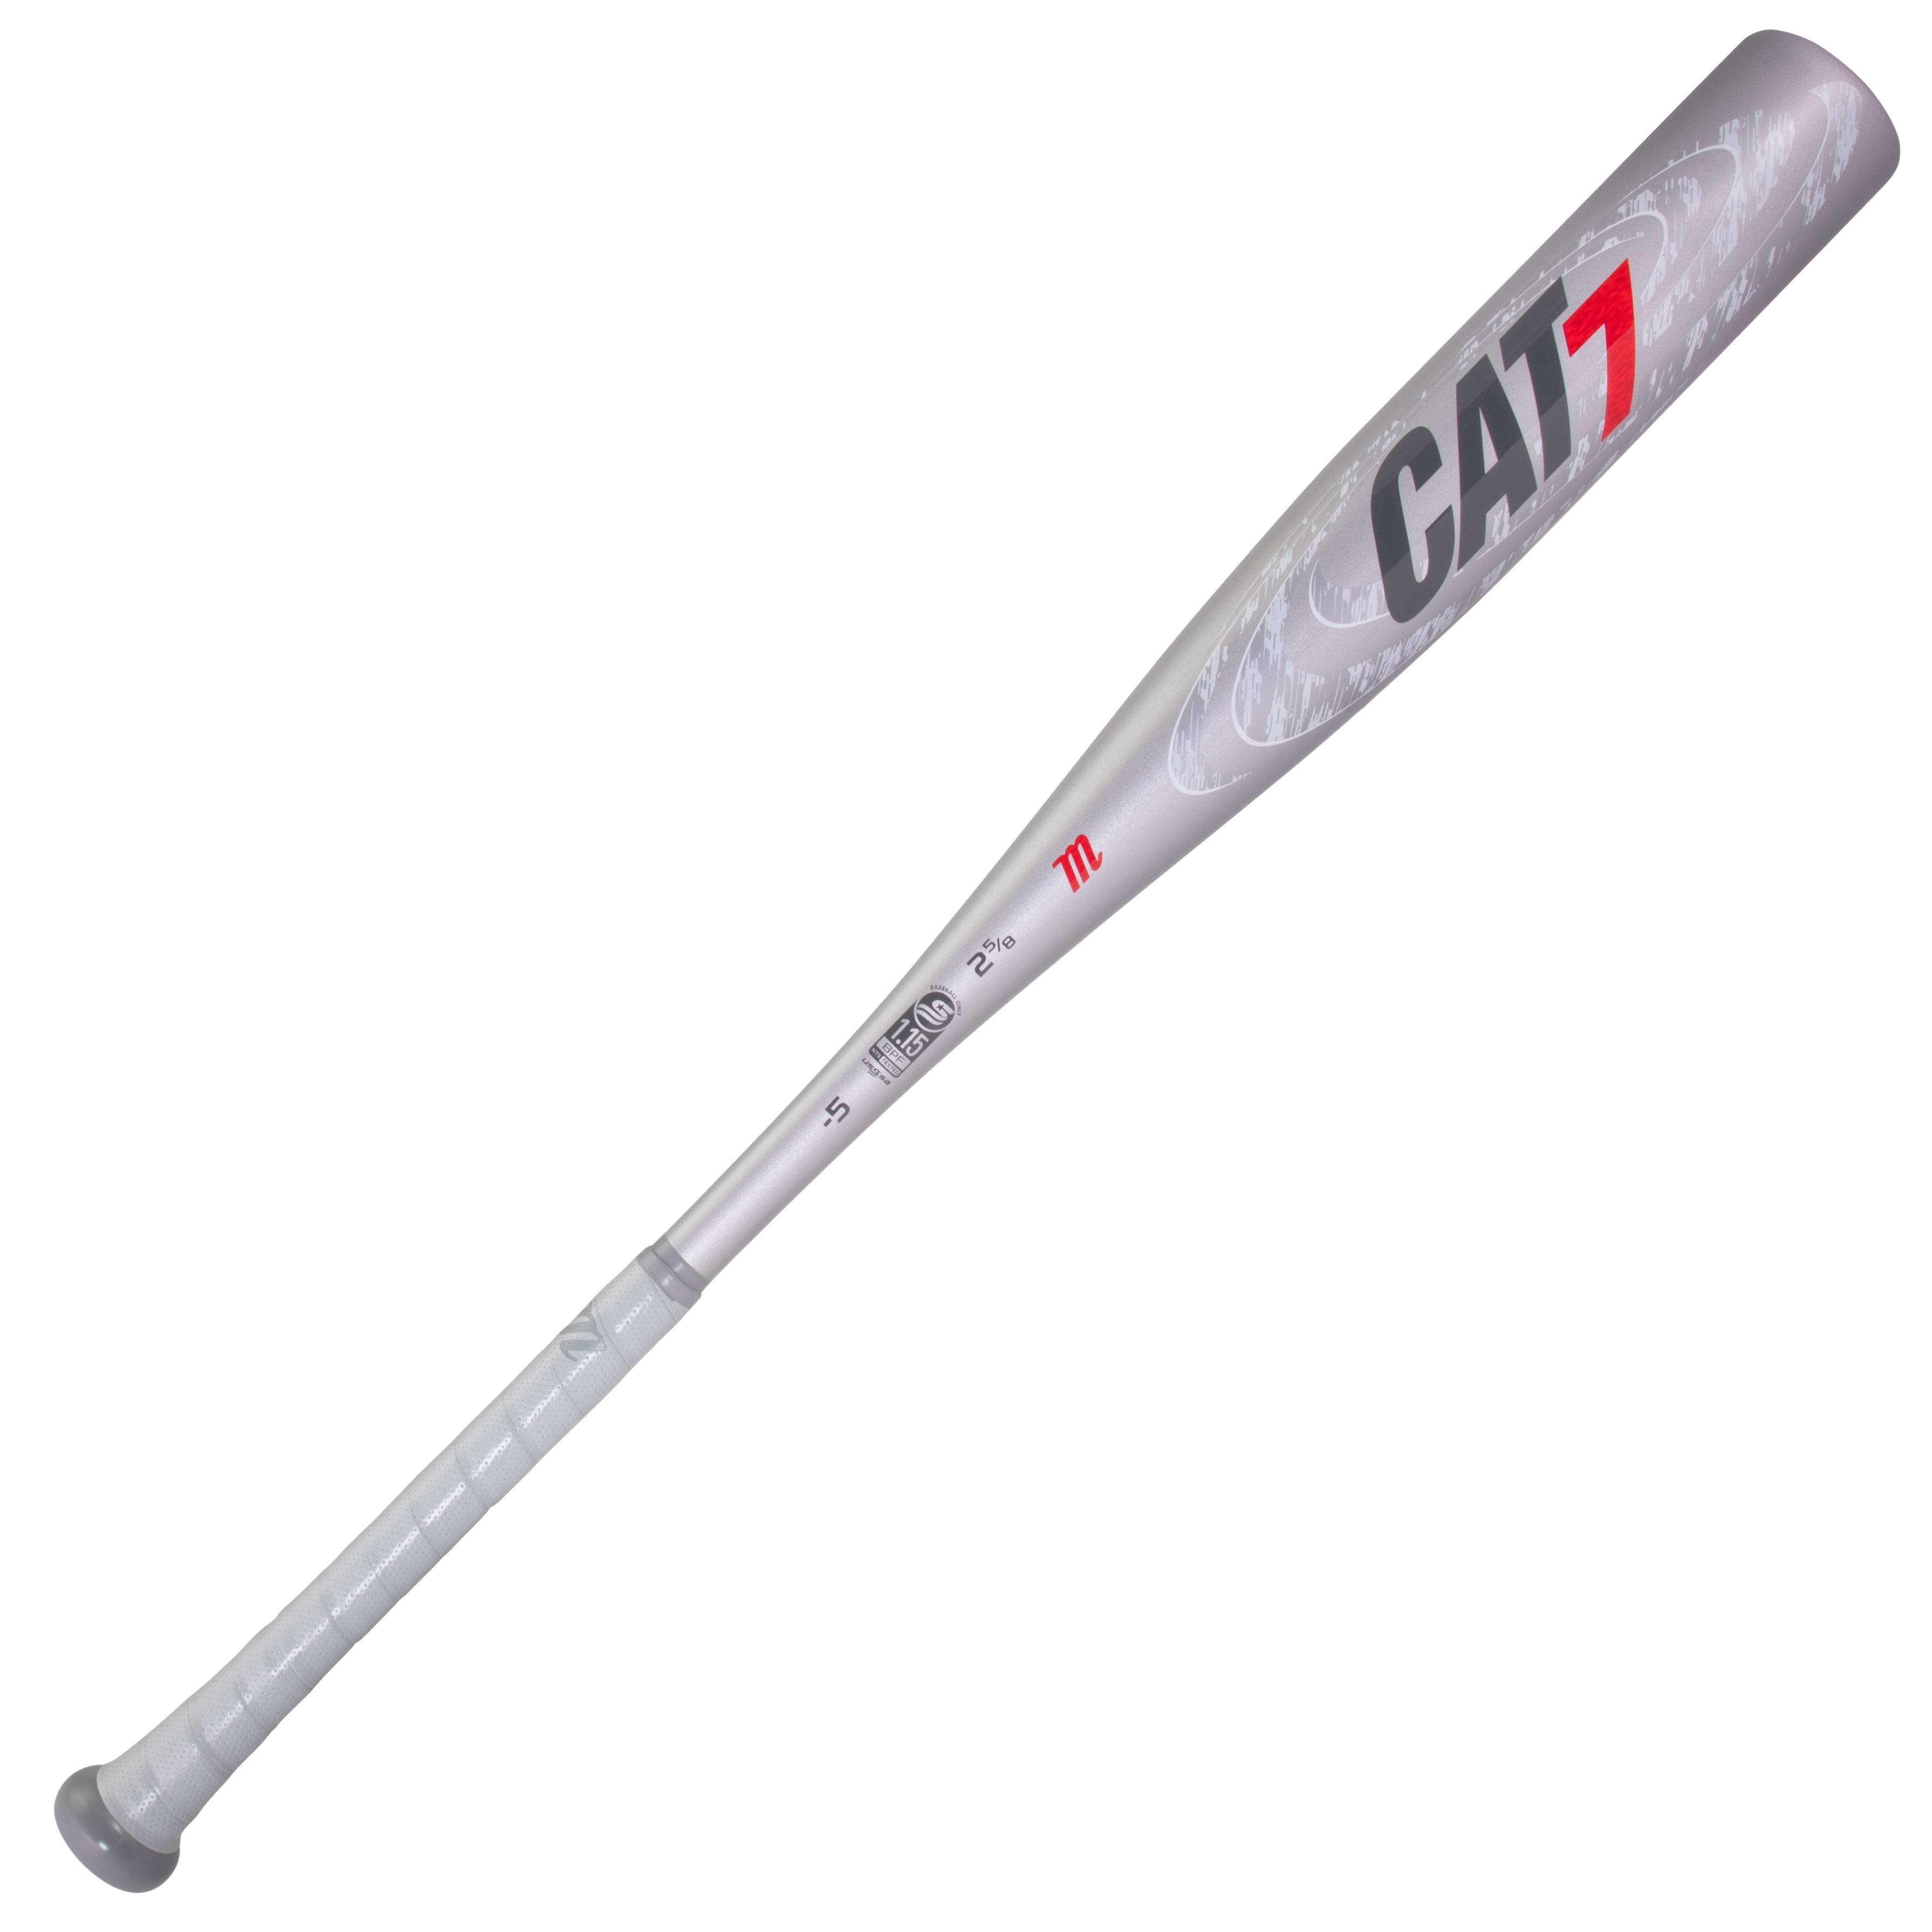 marucci-cat7-silver-5-baseball-bat-31-inch-26-oz MSBC725S-3126 Marucci